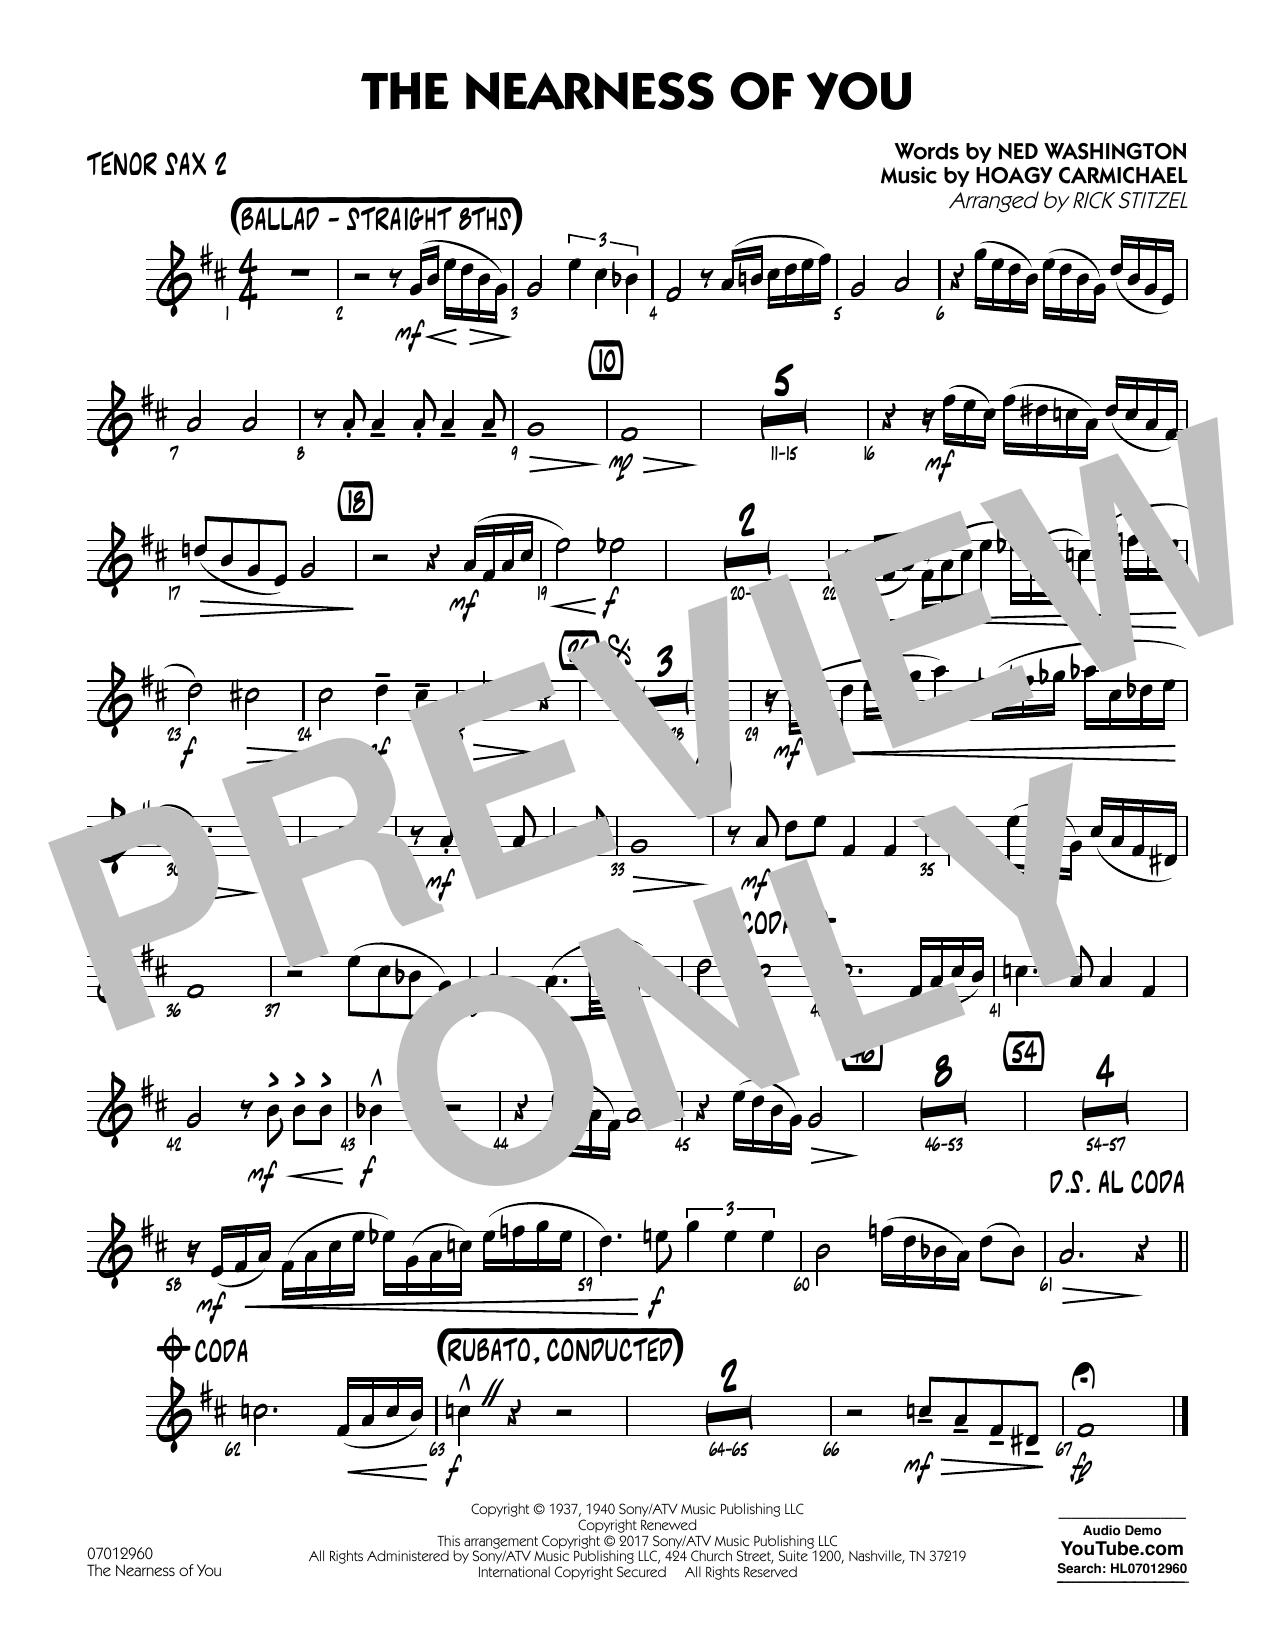 George Shearing - The Nearness of You (Key: C) - Tenor Sax 2